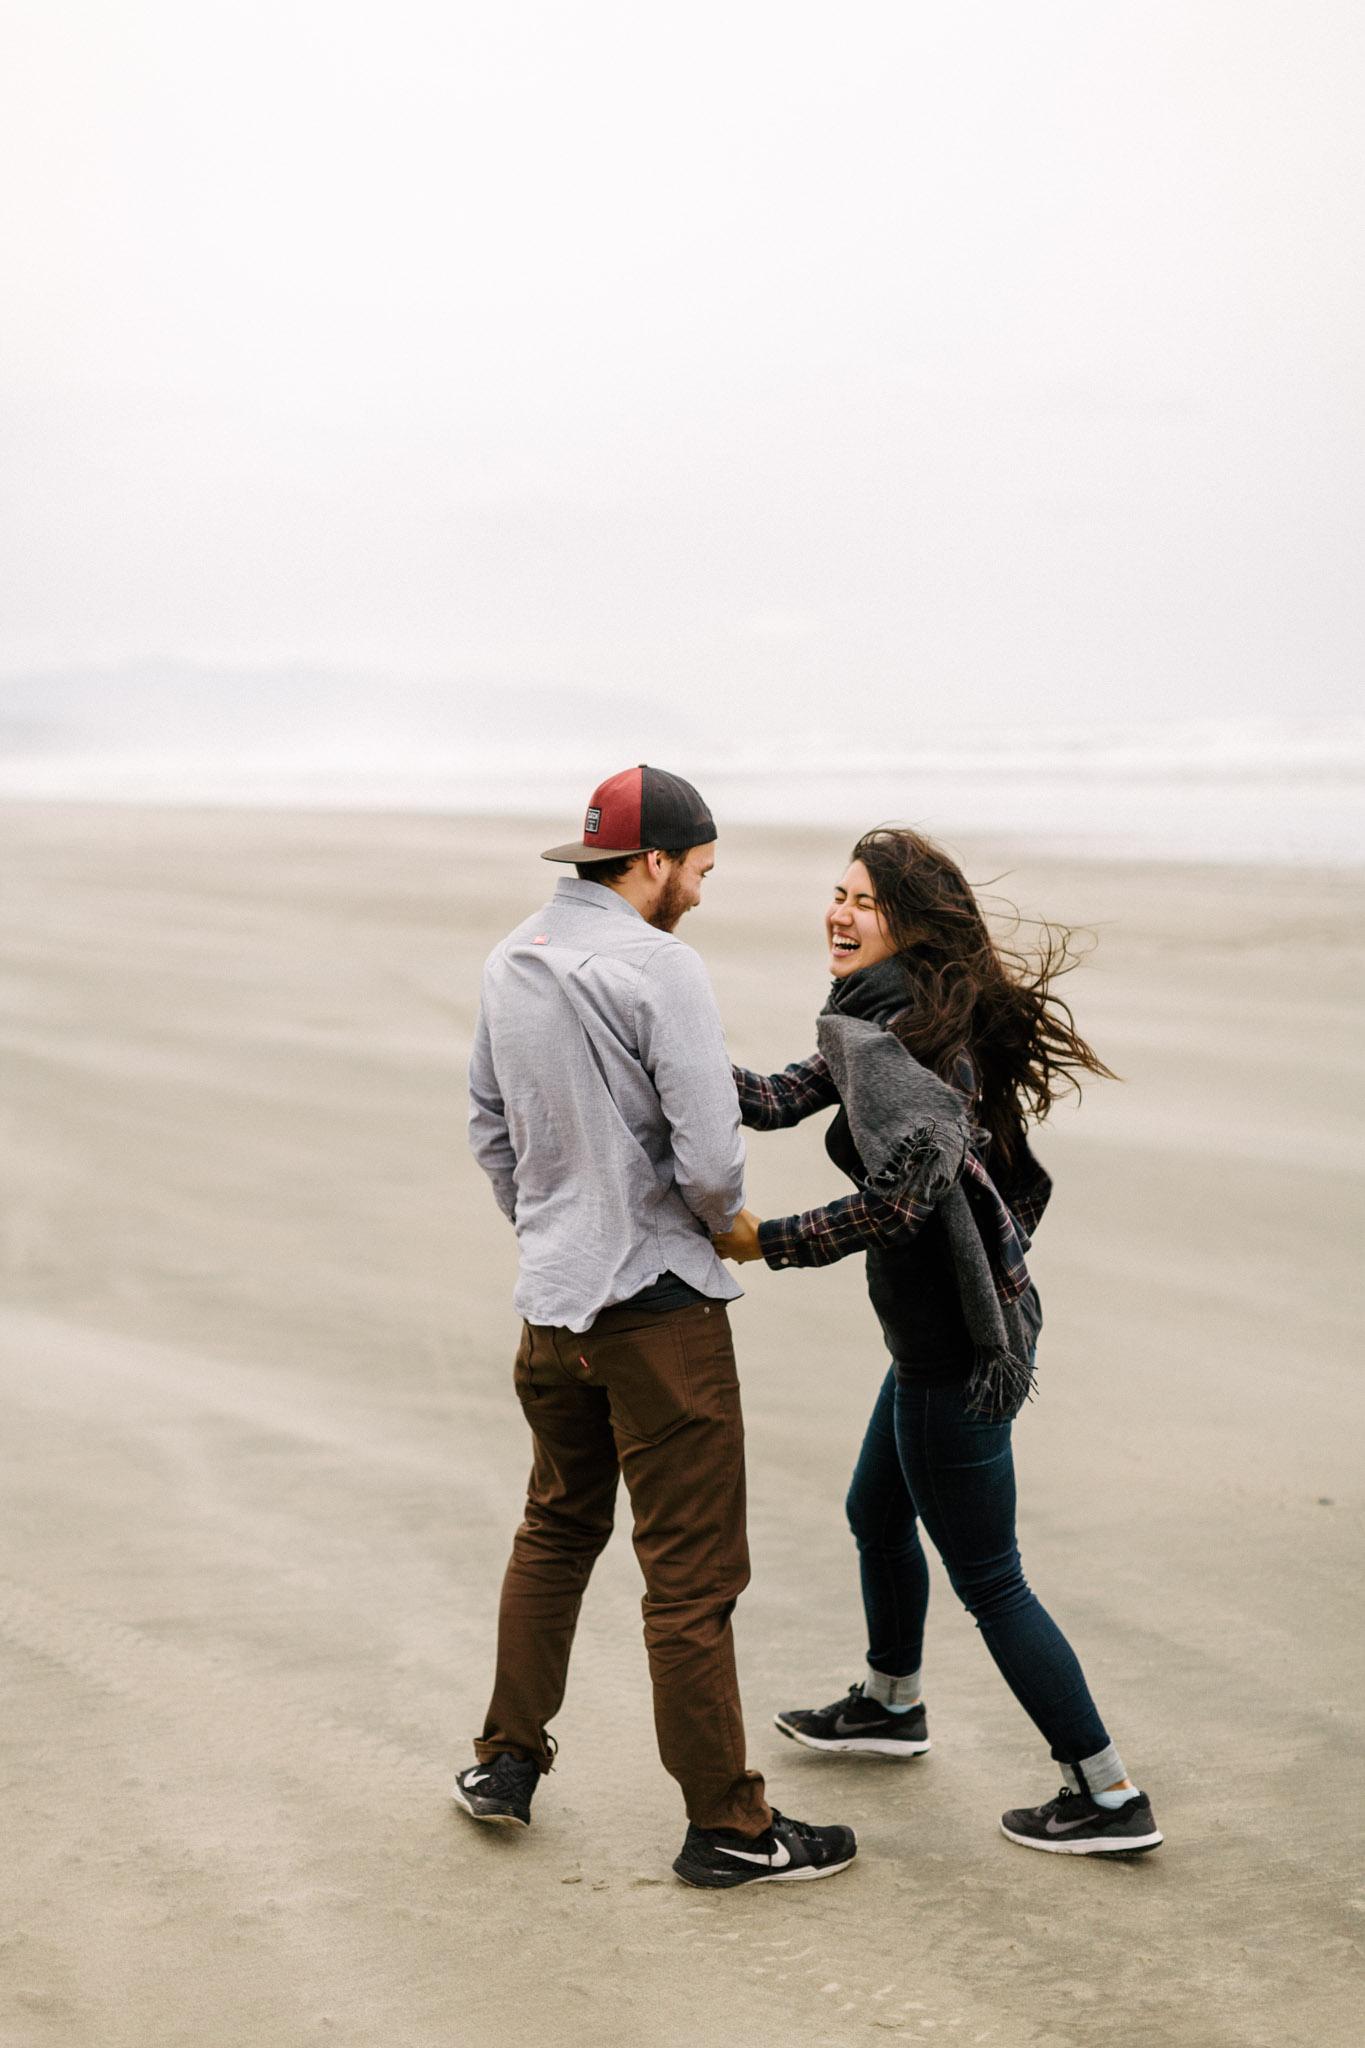 Oregon-Cape-Kiwanda-Engagement-Pia-Anna-Christian-Wedding-Photography-PNW-CJ-10.jpg